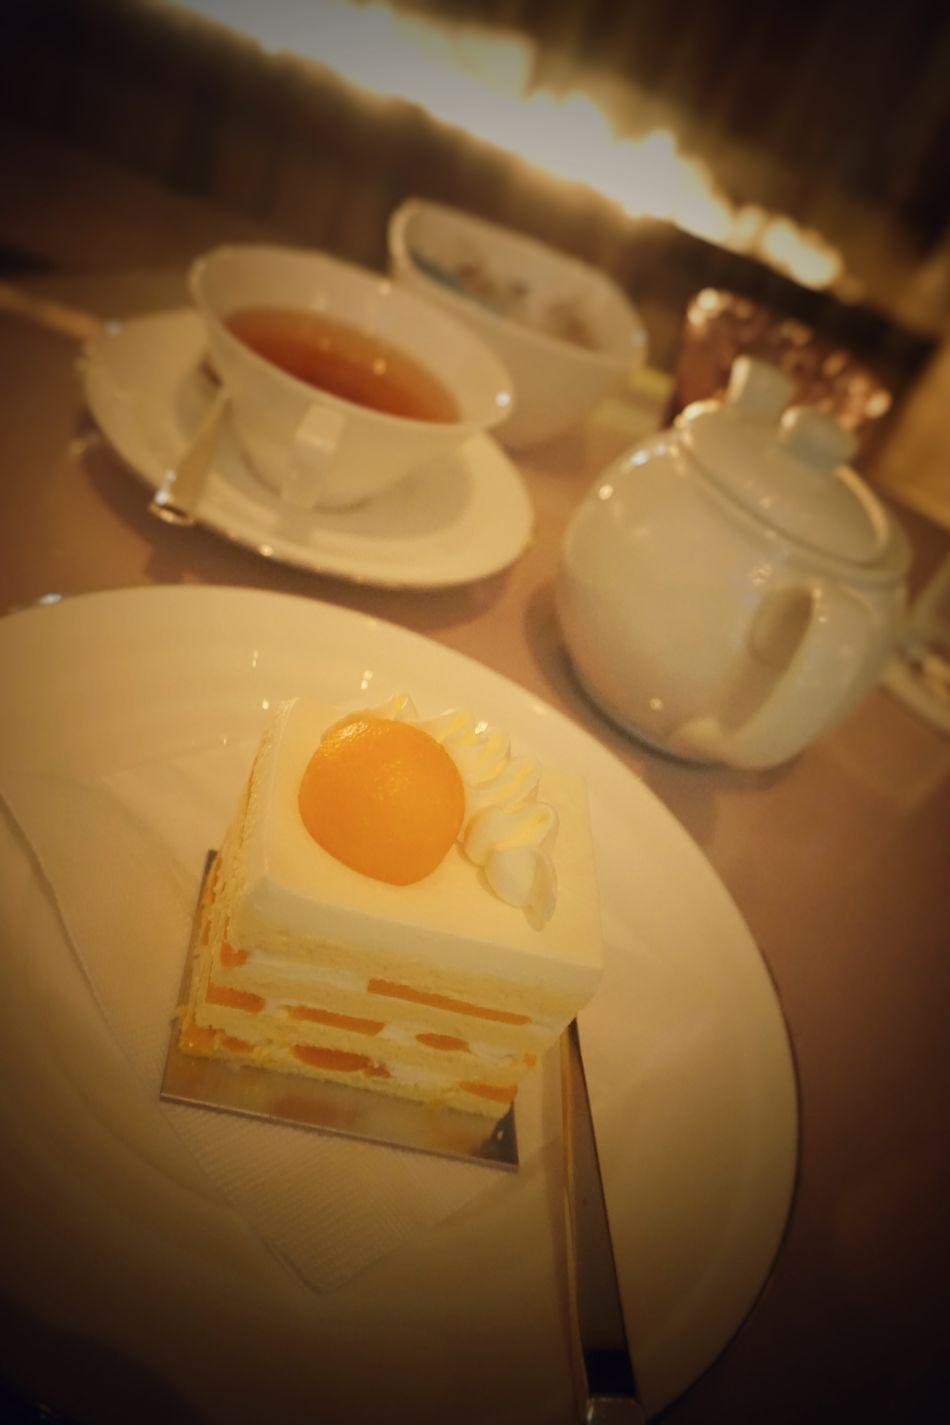 Cafe Cake Dessert Food Food And Drink Japan Lounge Palace Hotel Sweet Table Tea Tea Pot Tea Pots & Cups Tokyo ケーキ パレスホテル 2016